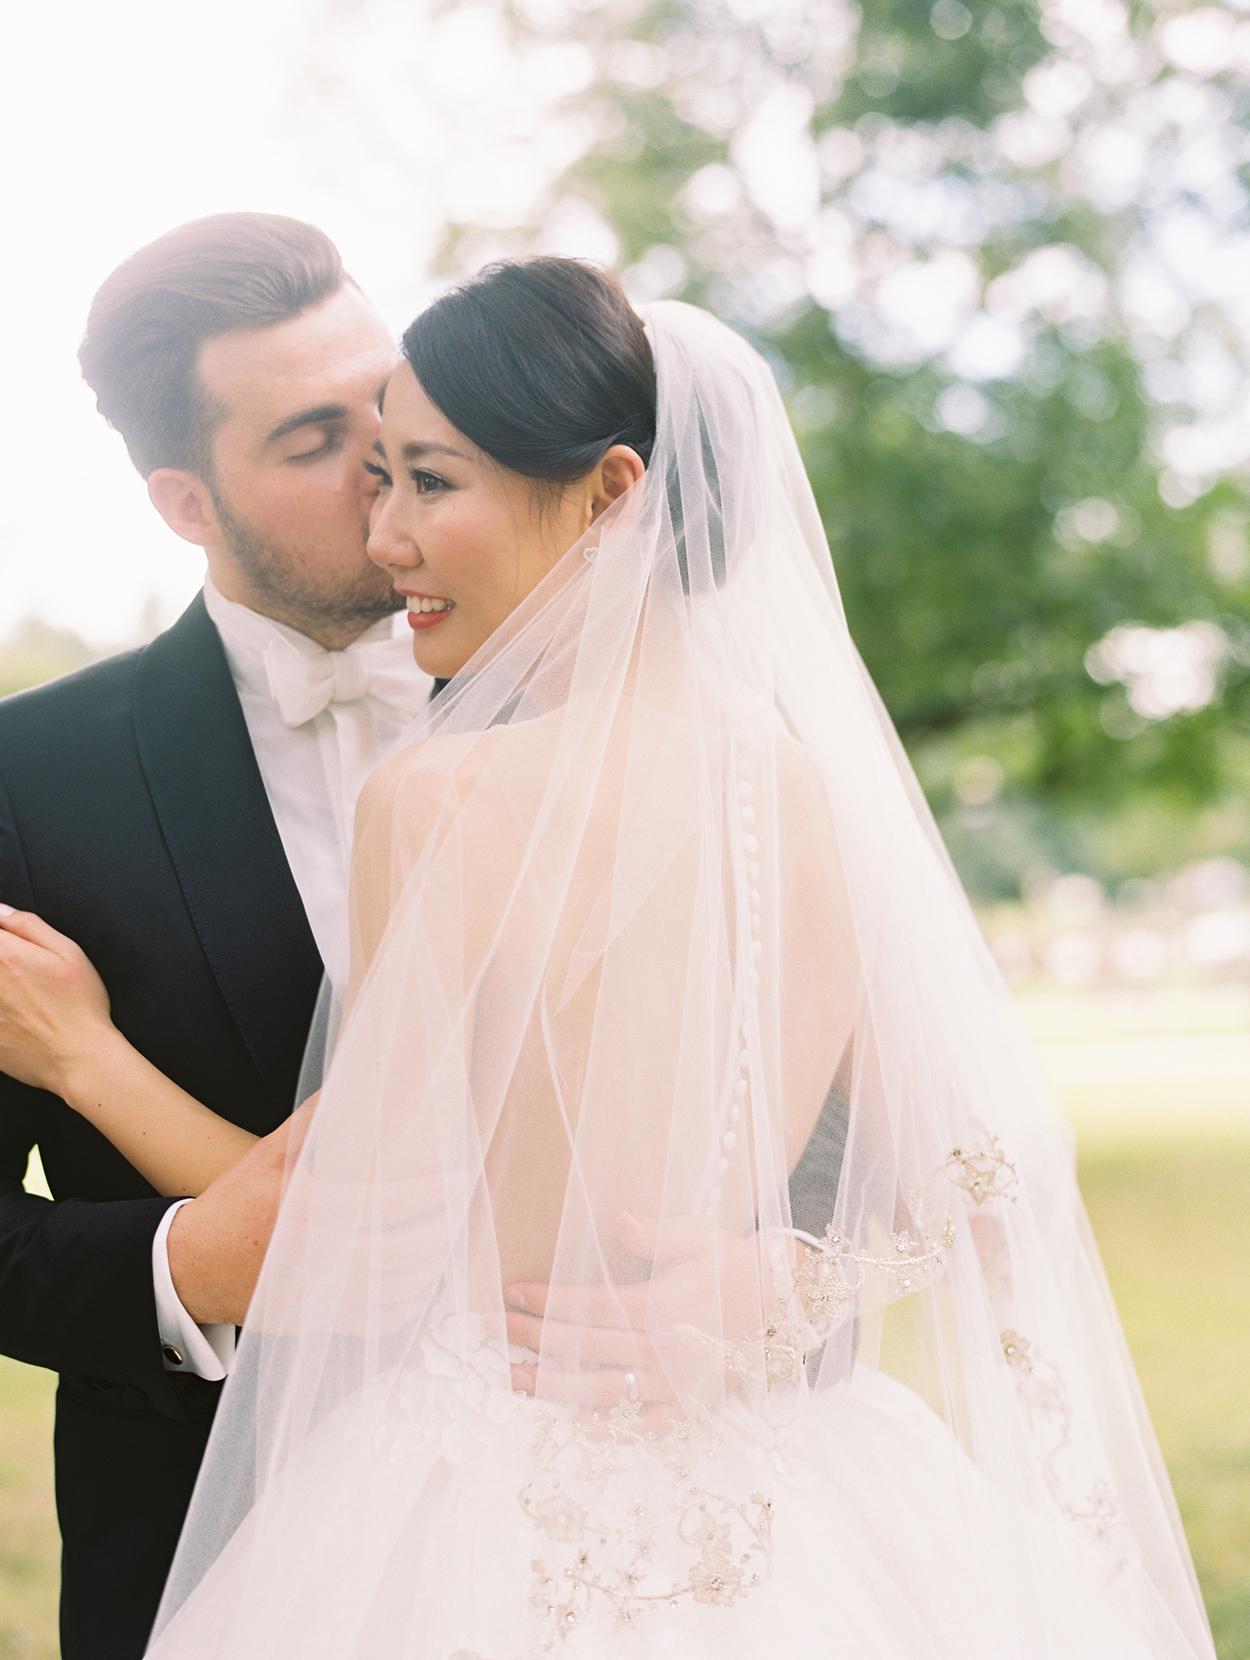 groom kisses bride's cheek while couple embraces